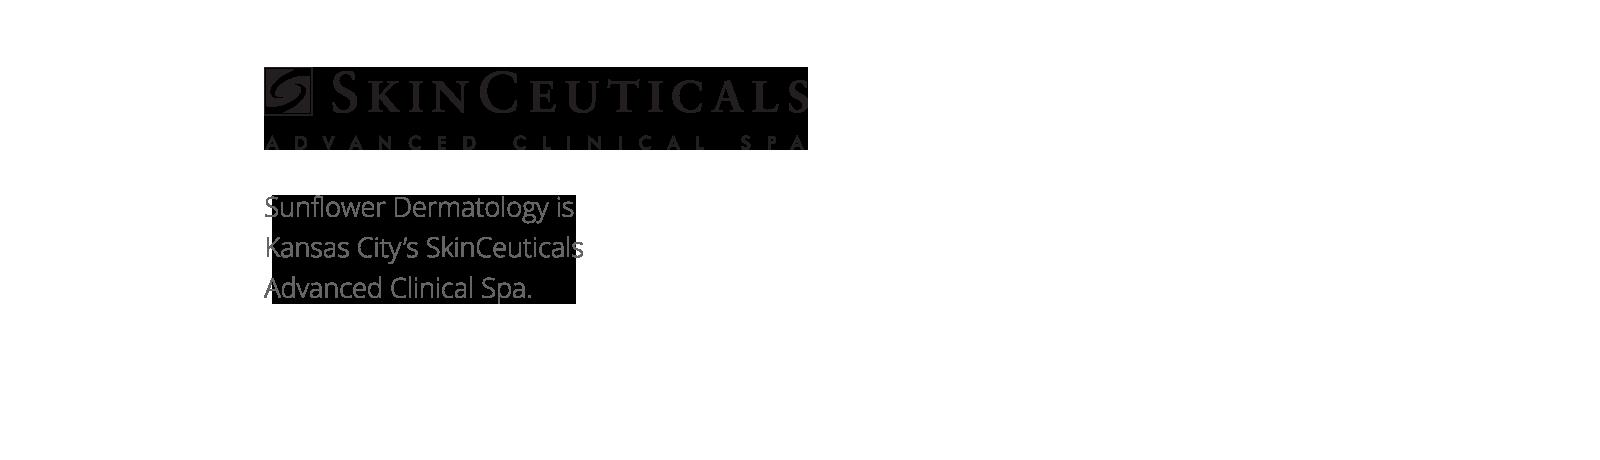 sunflower-dermatology-kansas-city-skinceuticals-advanced-clinical